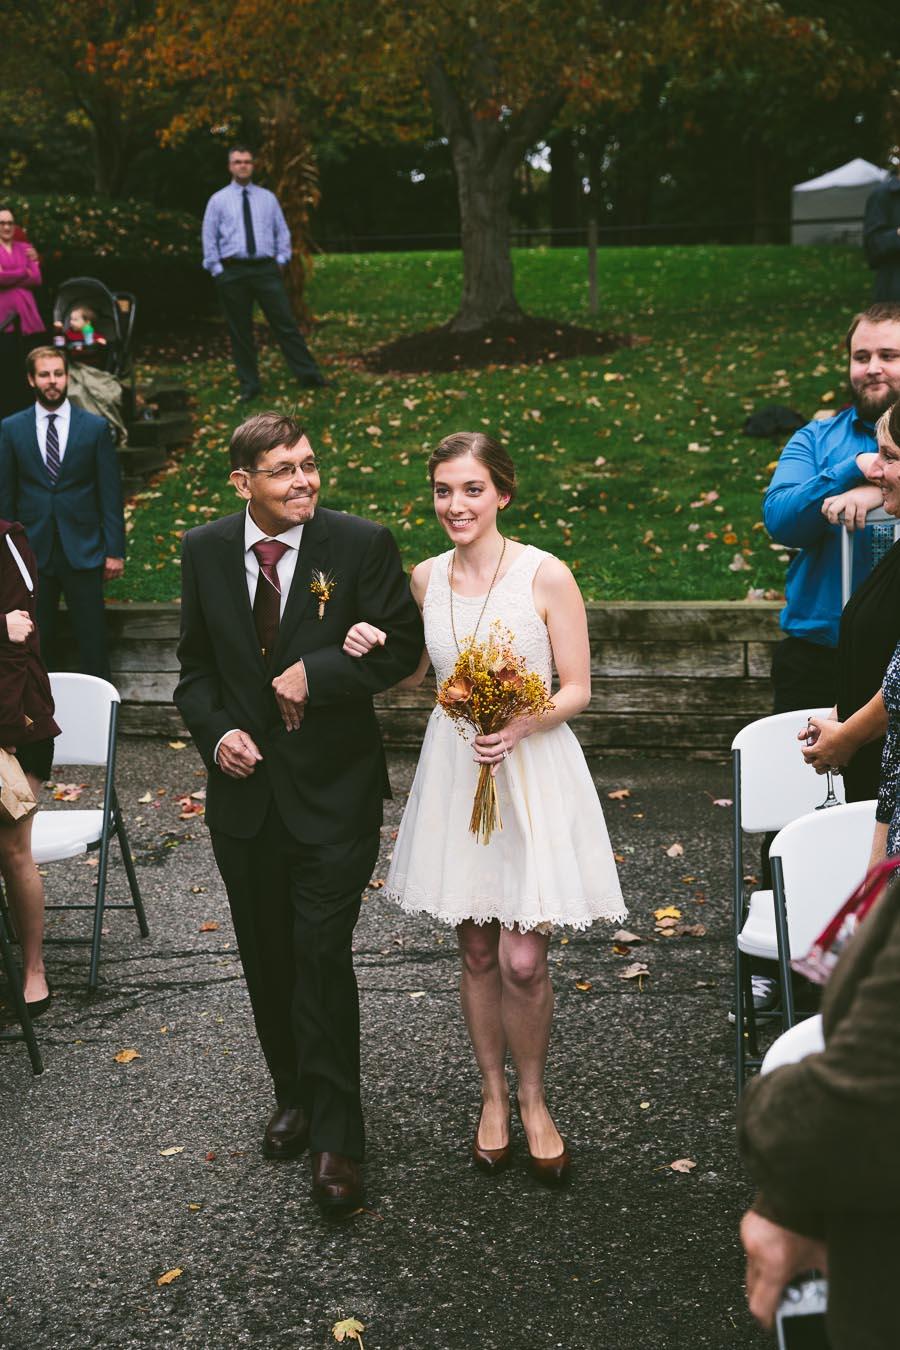 chesterland-ohio-wedding-photography-orchard-hills-paterson-fruit-farm-18.jpg